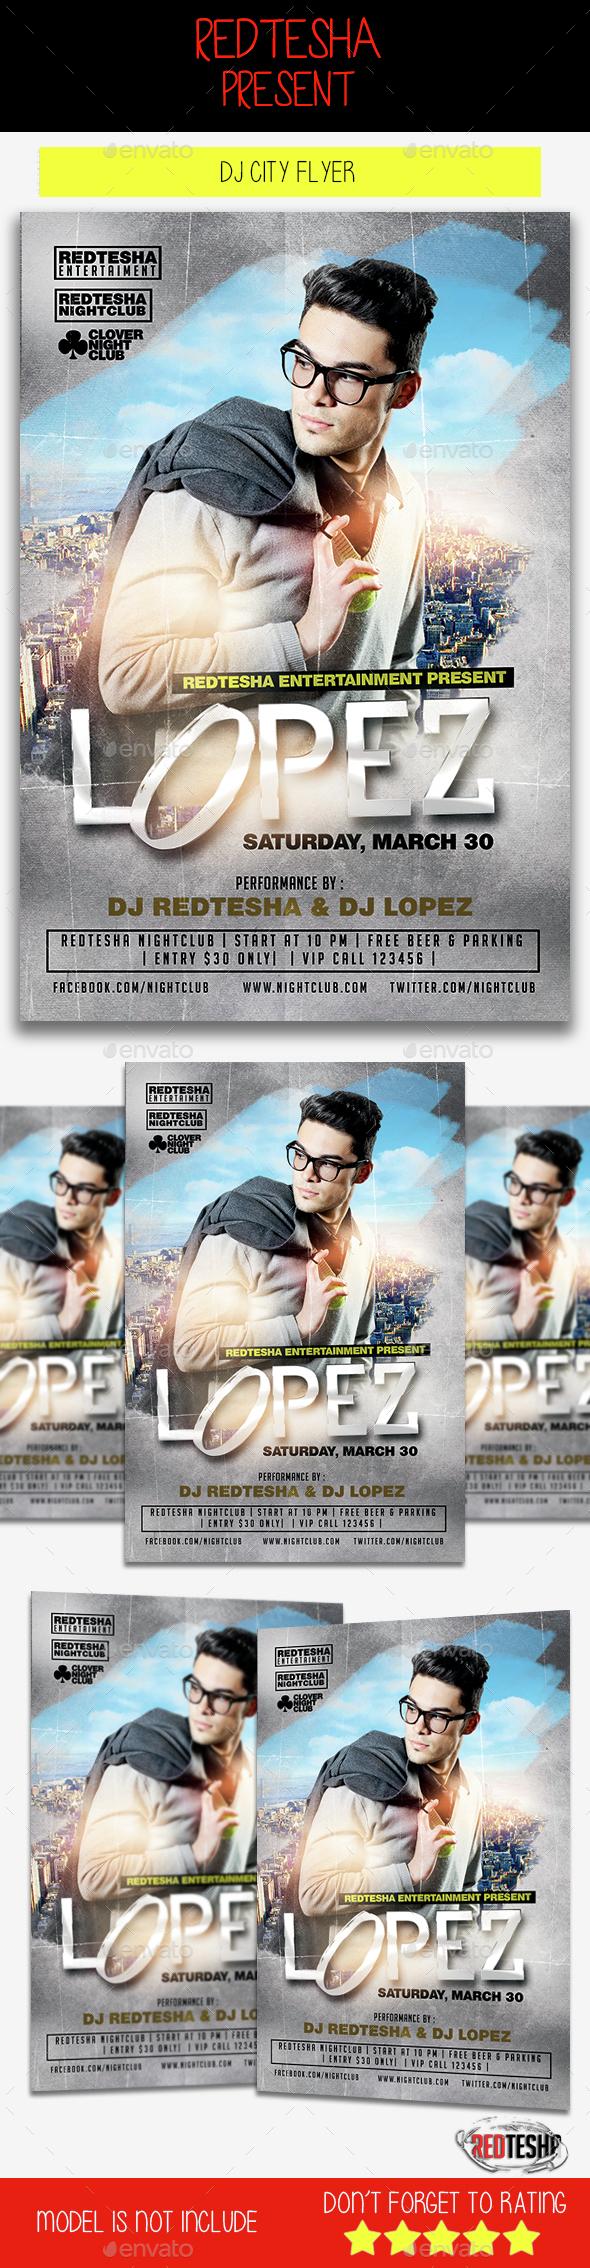 DJ City Flyer - Clubs & Parties Events